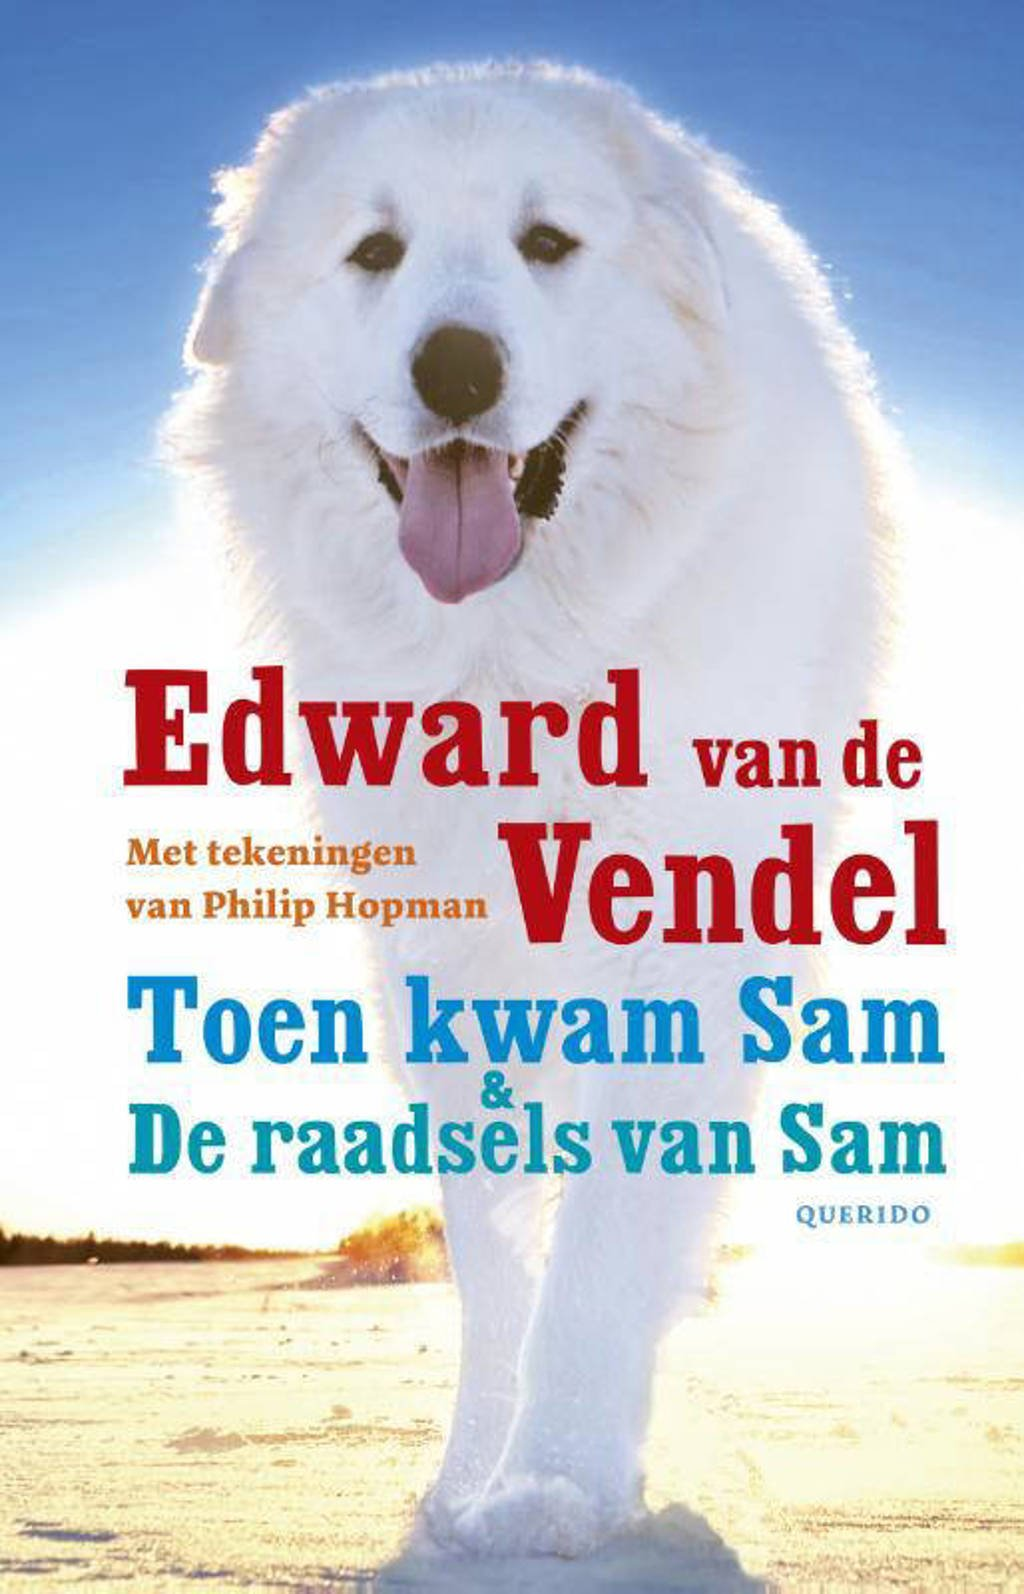 Toen kwam Sam & De raadsels van Sam - Edward van de Vendel